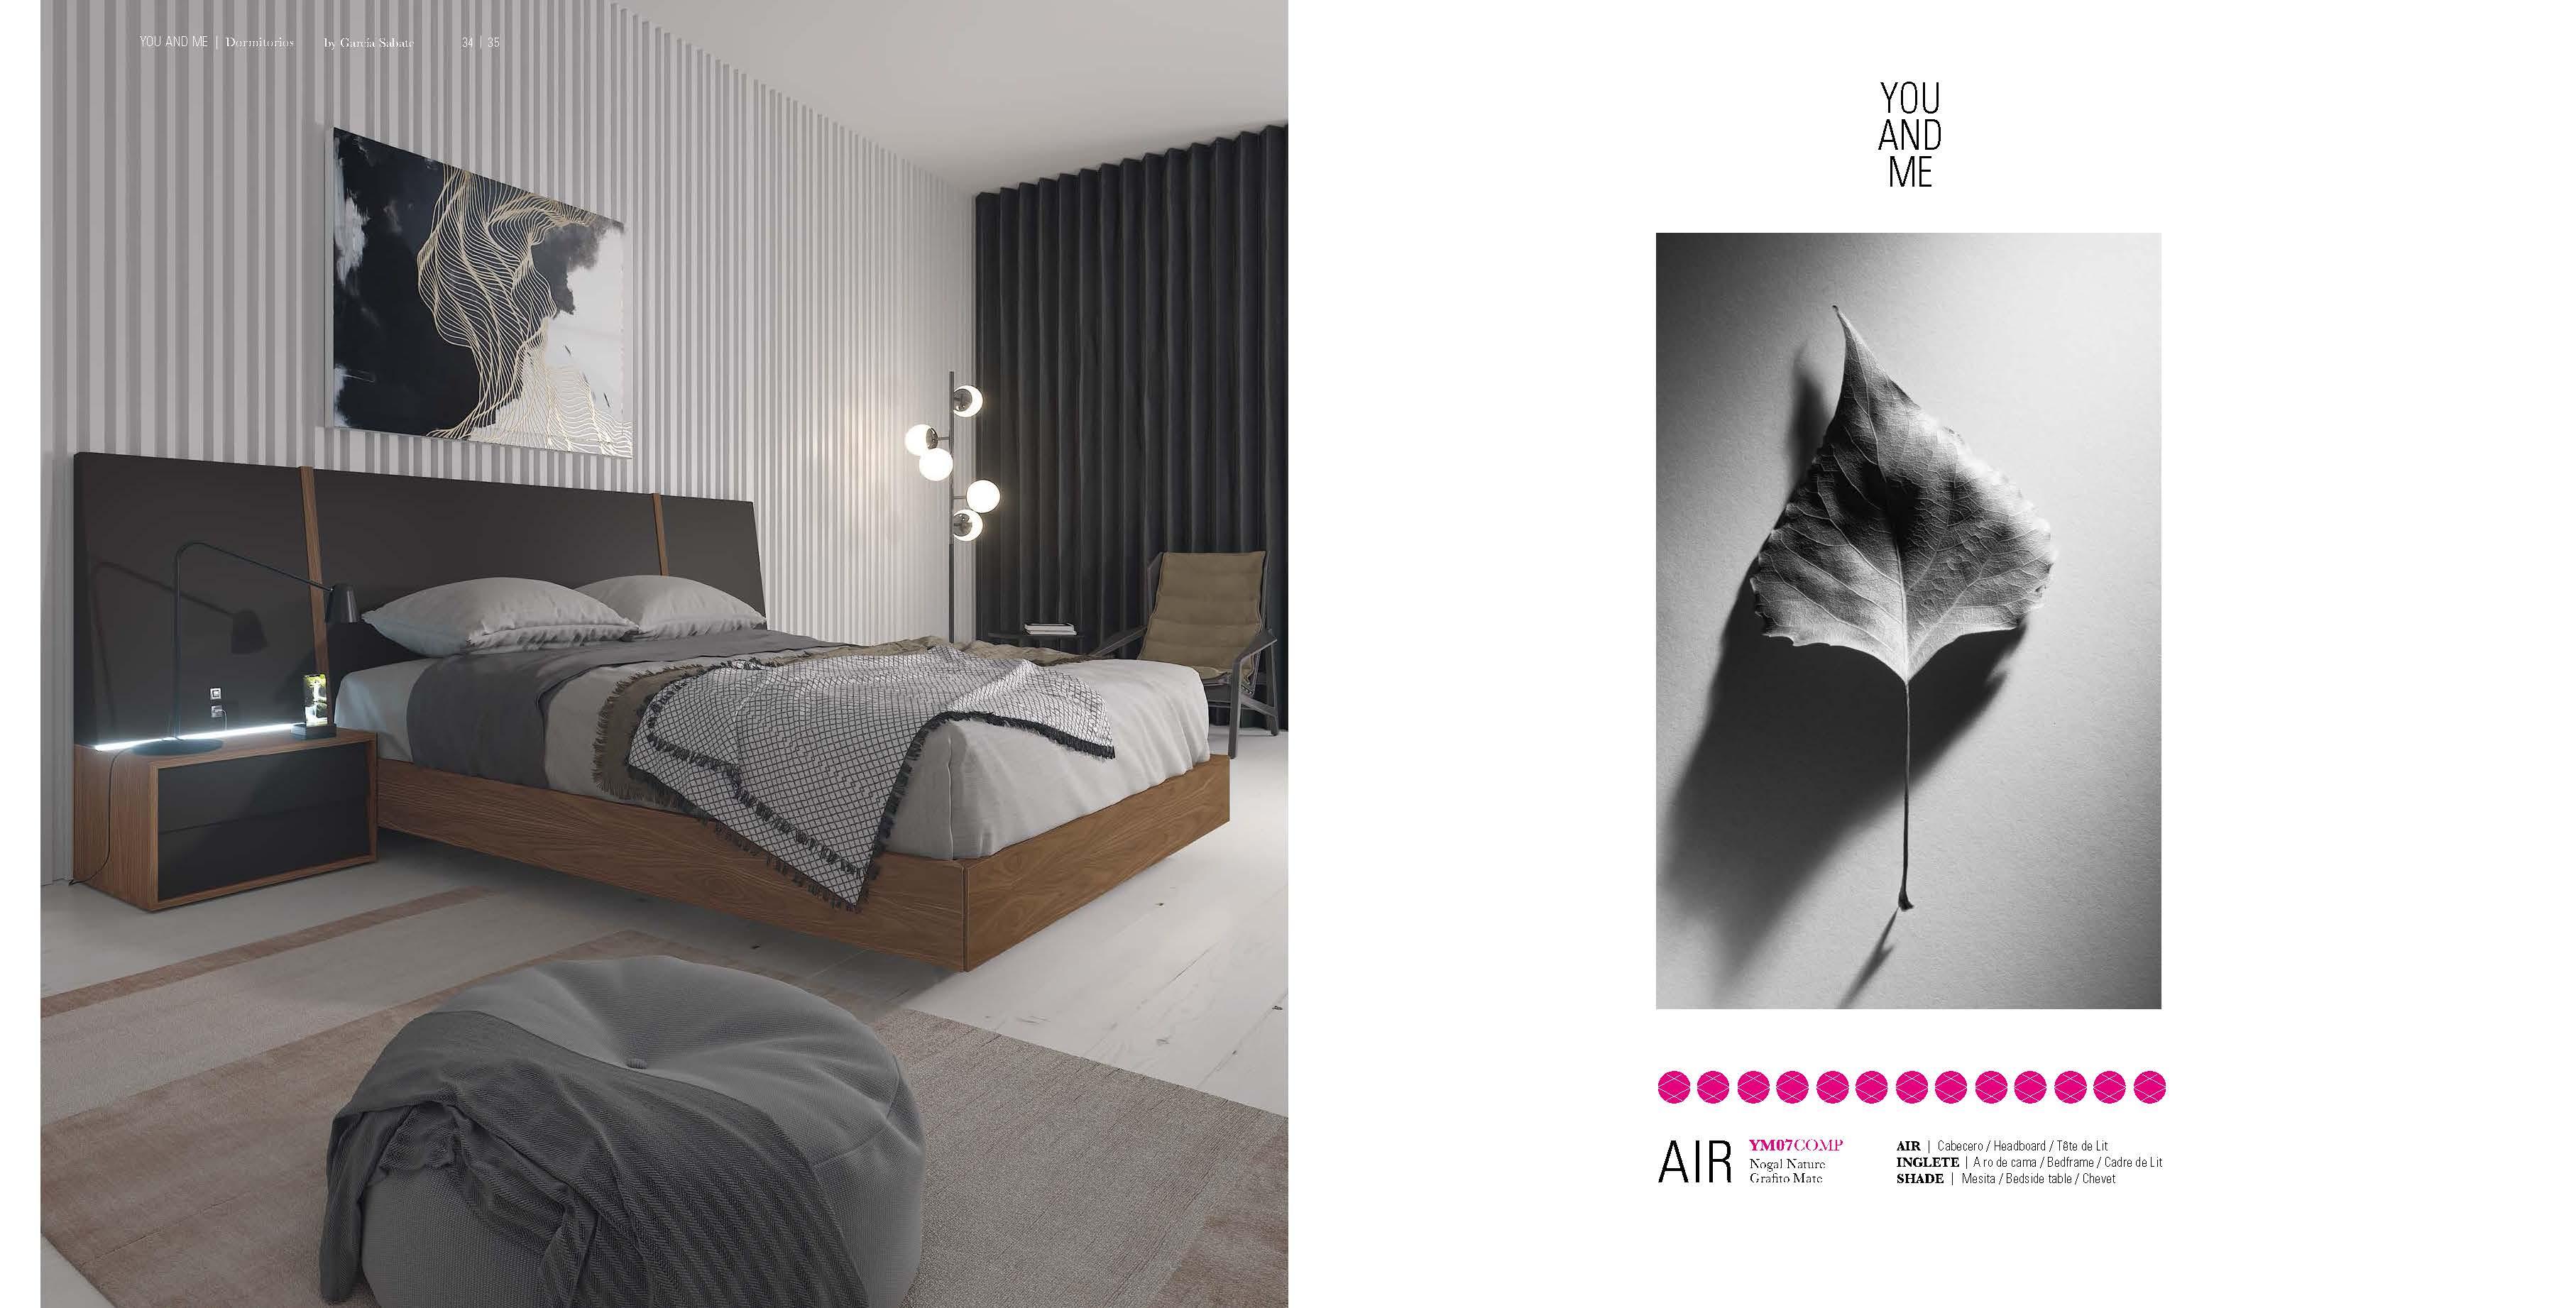 YM07, Wardrobes, Bedroom Furniture